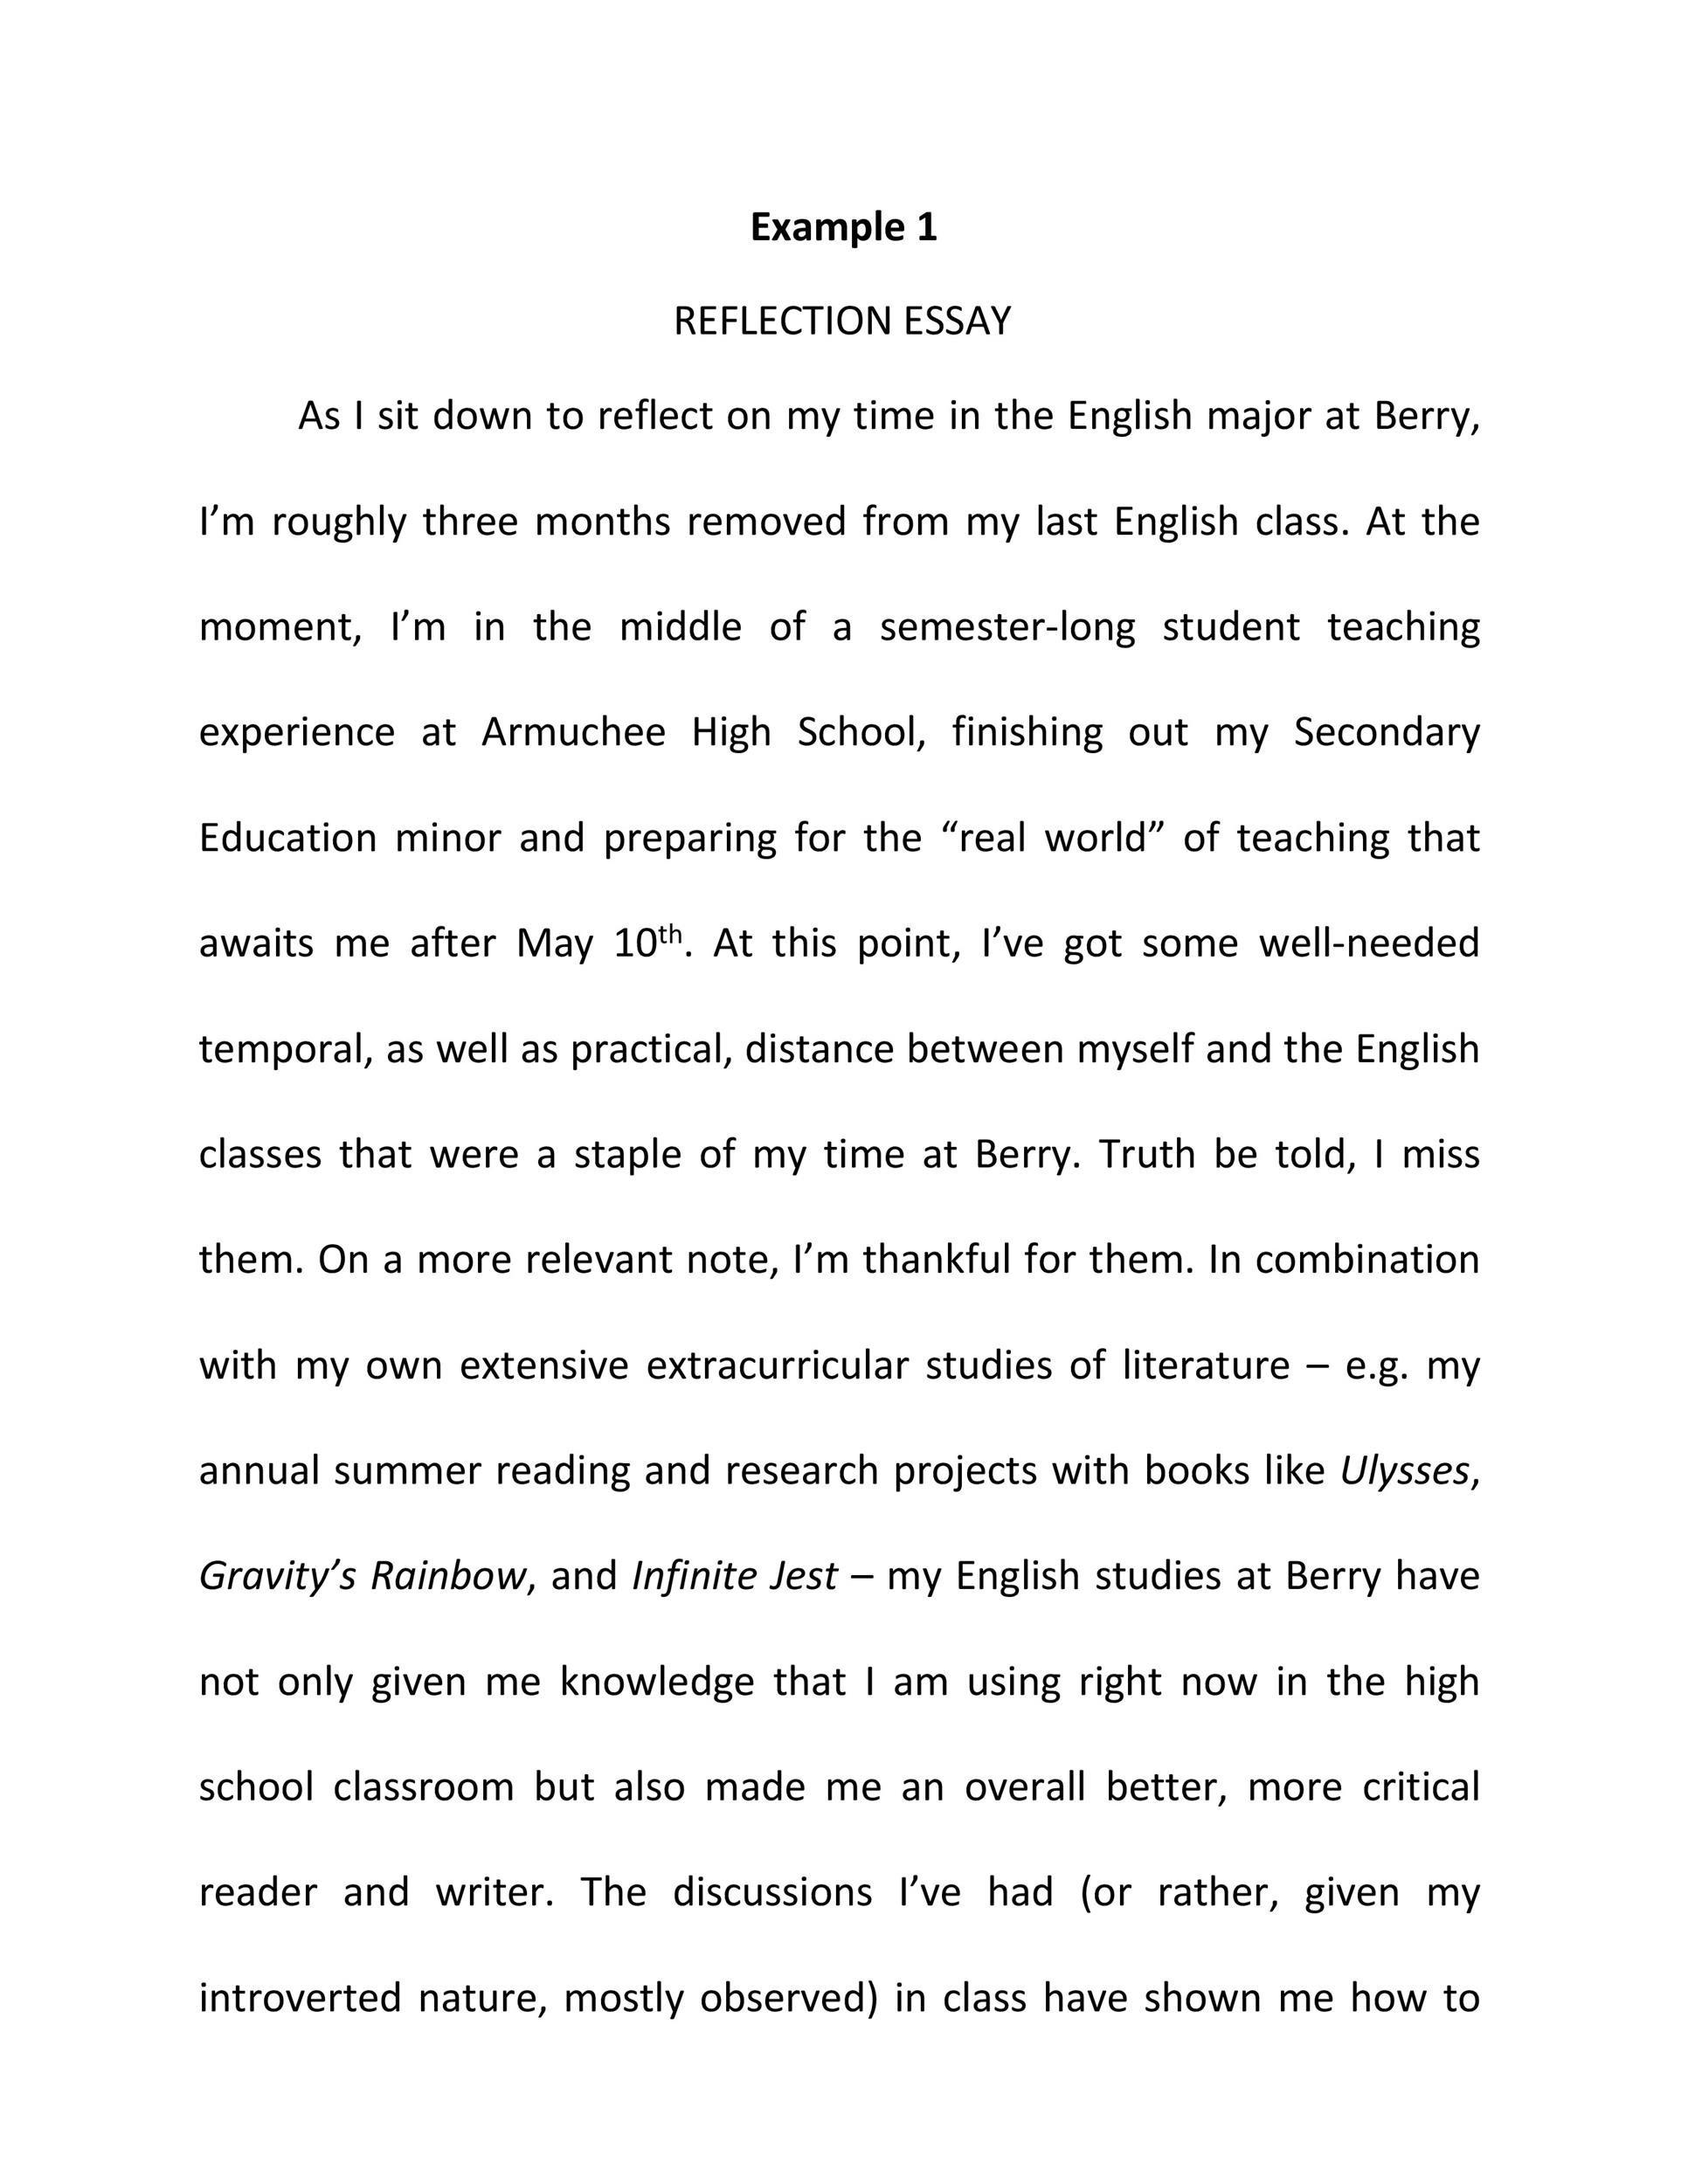 Free reflective essay example 01